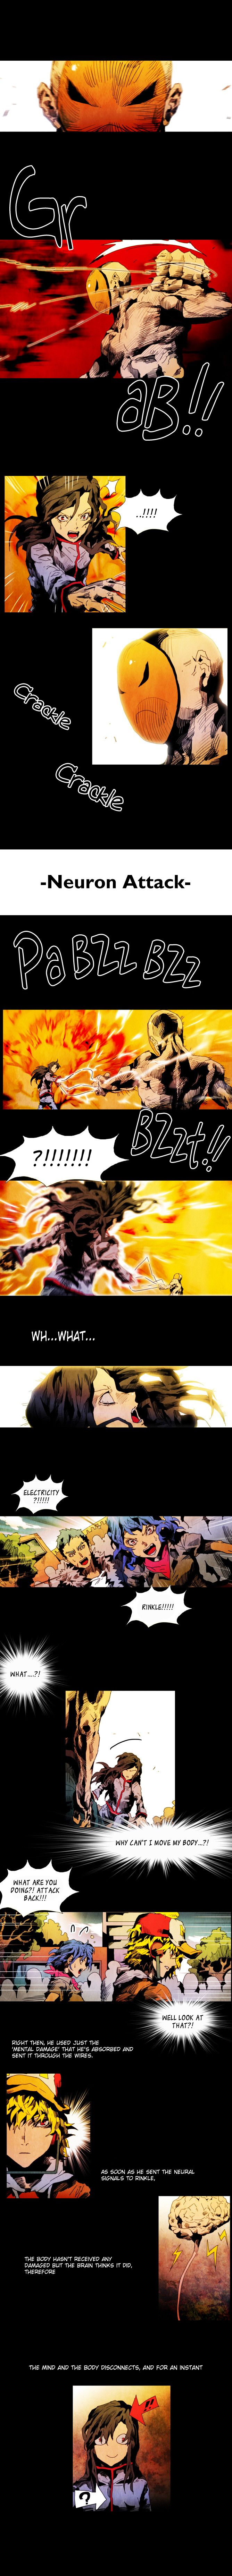 Black Behemoth 9 Page 2